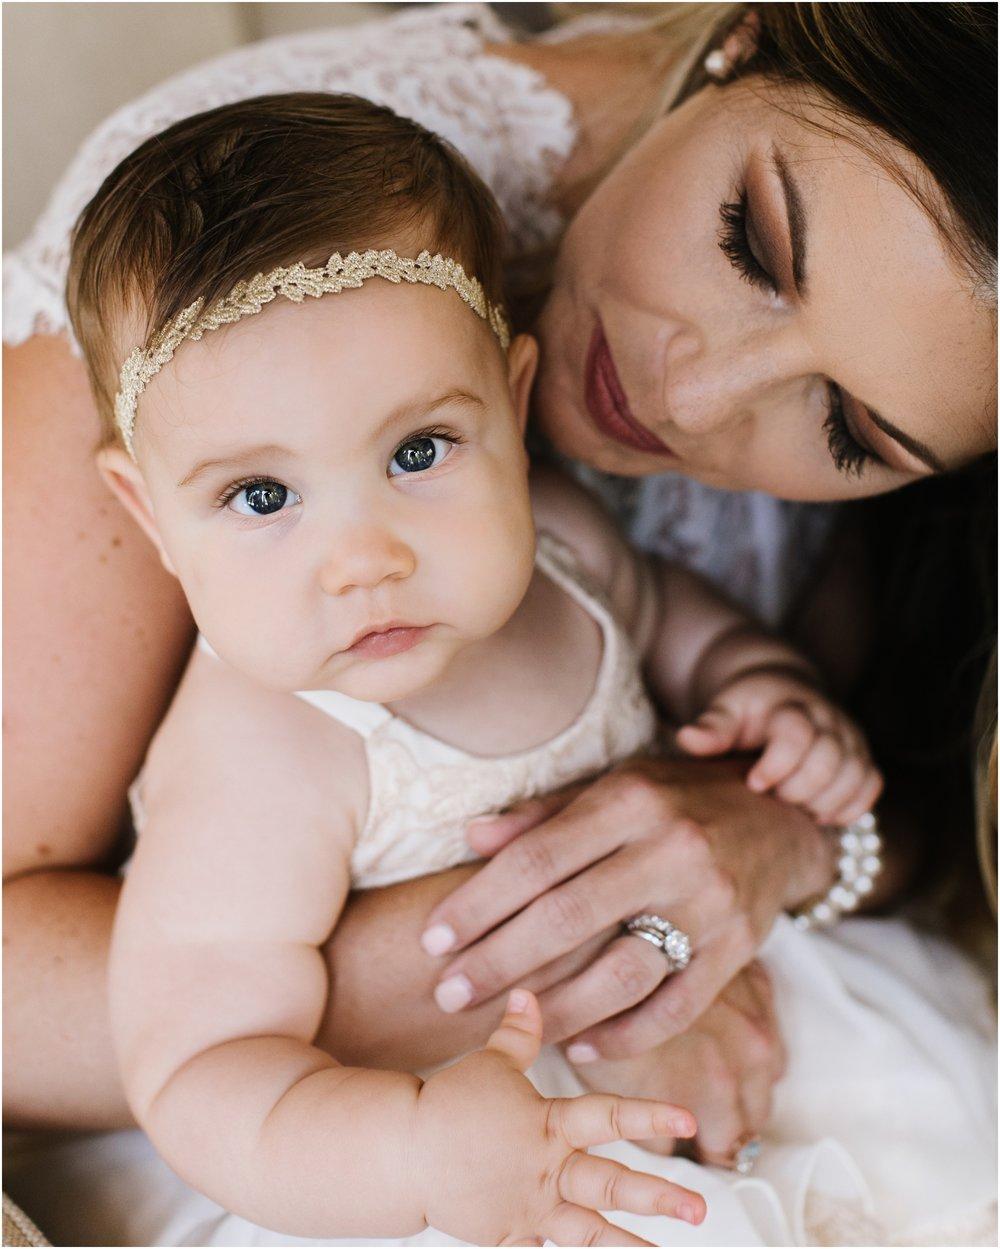 Mire-Blessing-Baptism-Family-2018-June-8847_quaint-and-whim-lifestyle-photographer-louisiana-.jpg